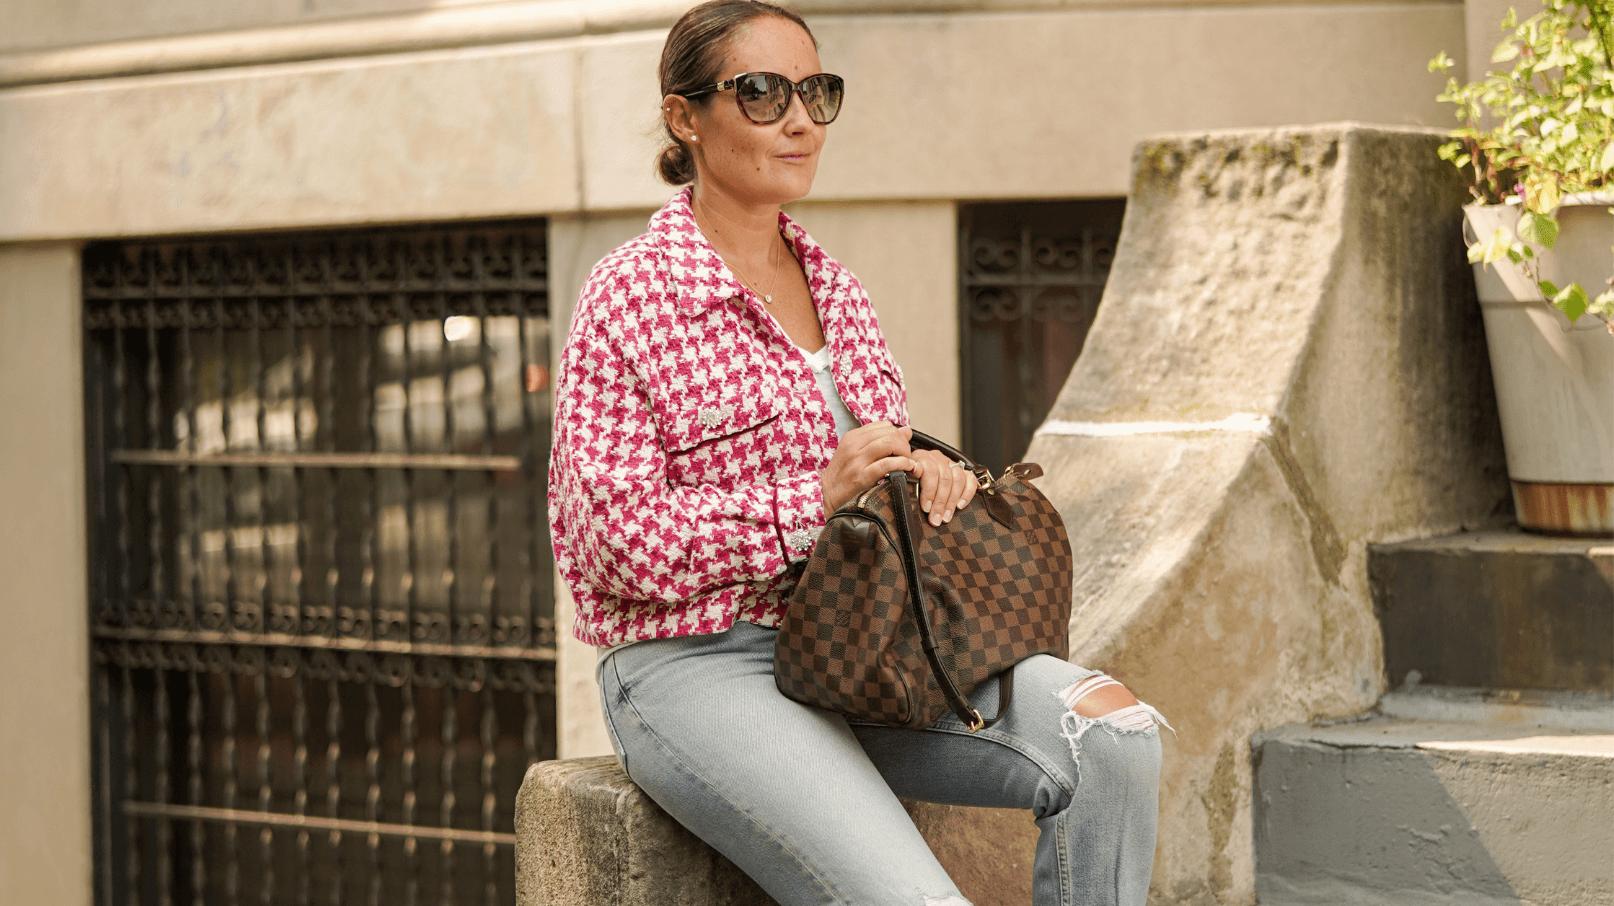 Zara Jacket ReDone Jeans Free People Tee Vivaia Shoes LV Bag Look